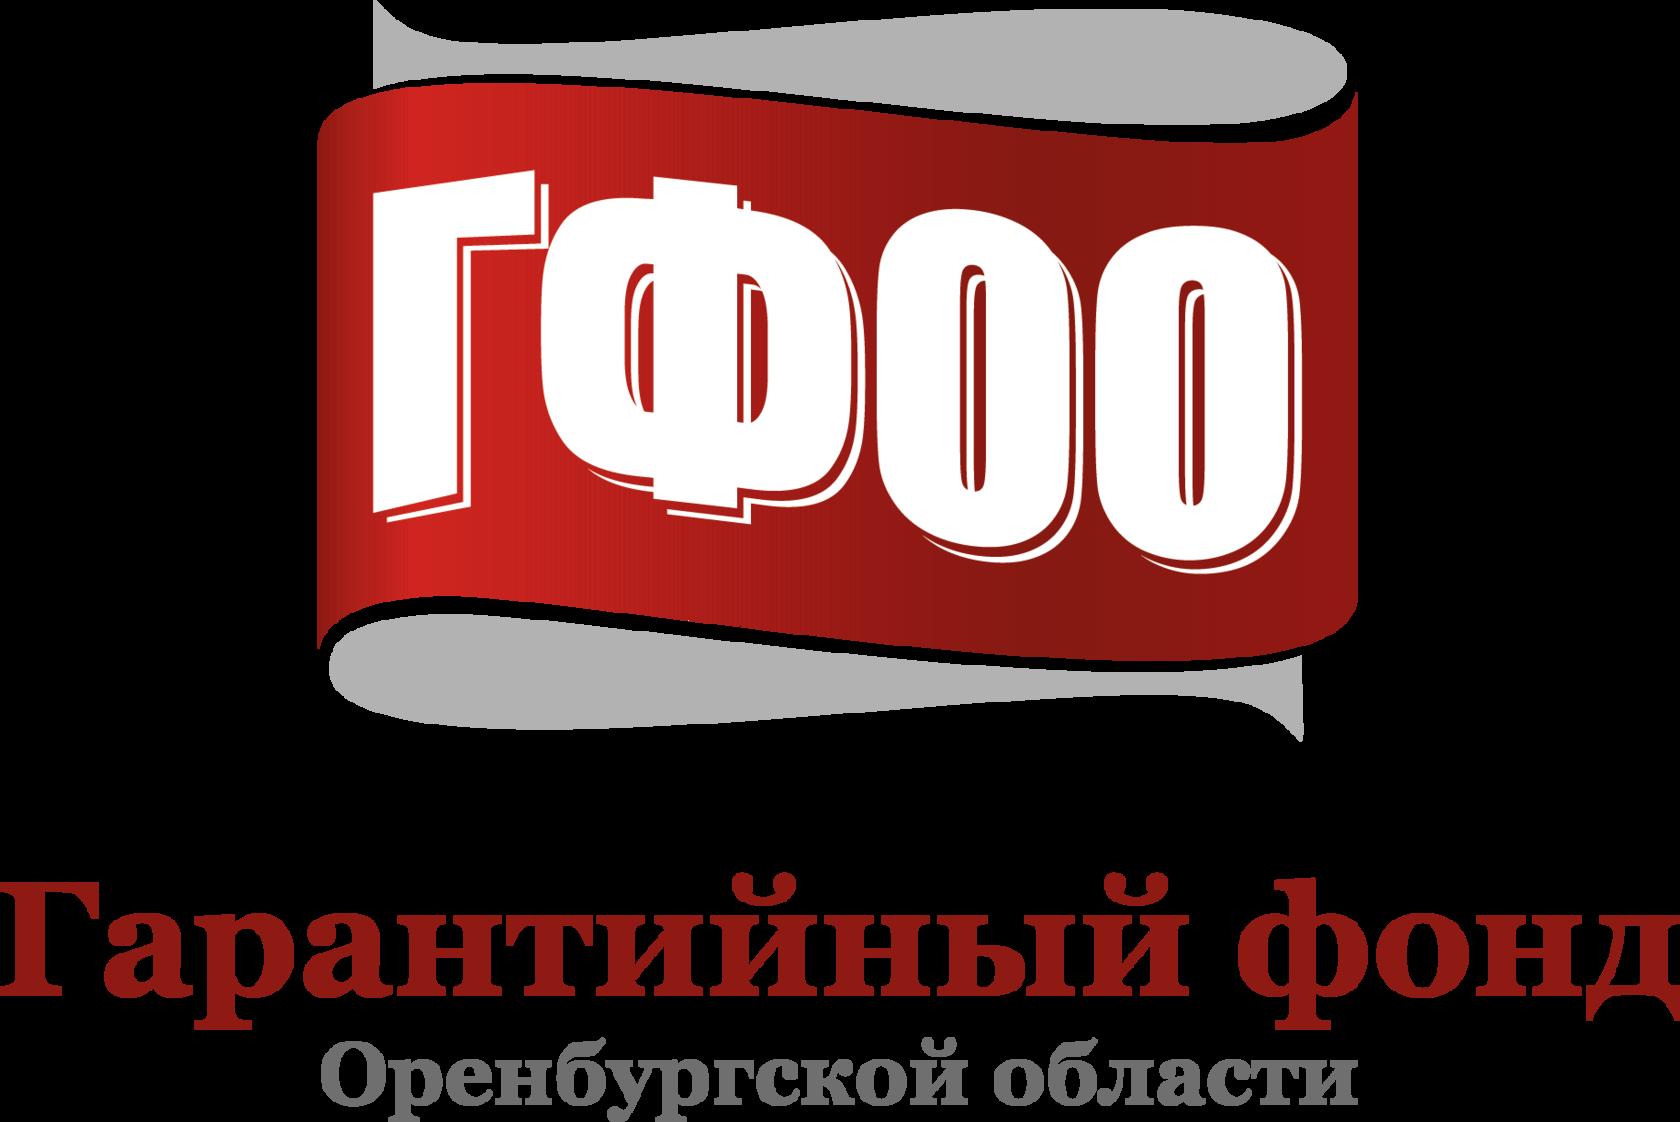 Гарантийный фонд Оренбургской области